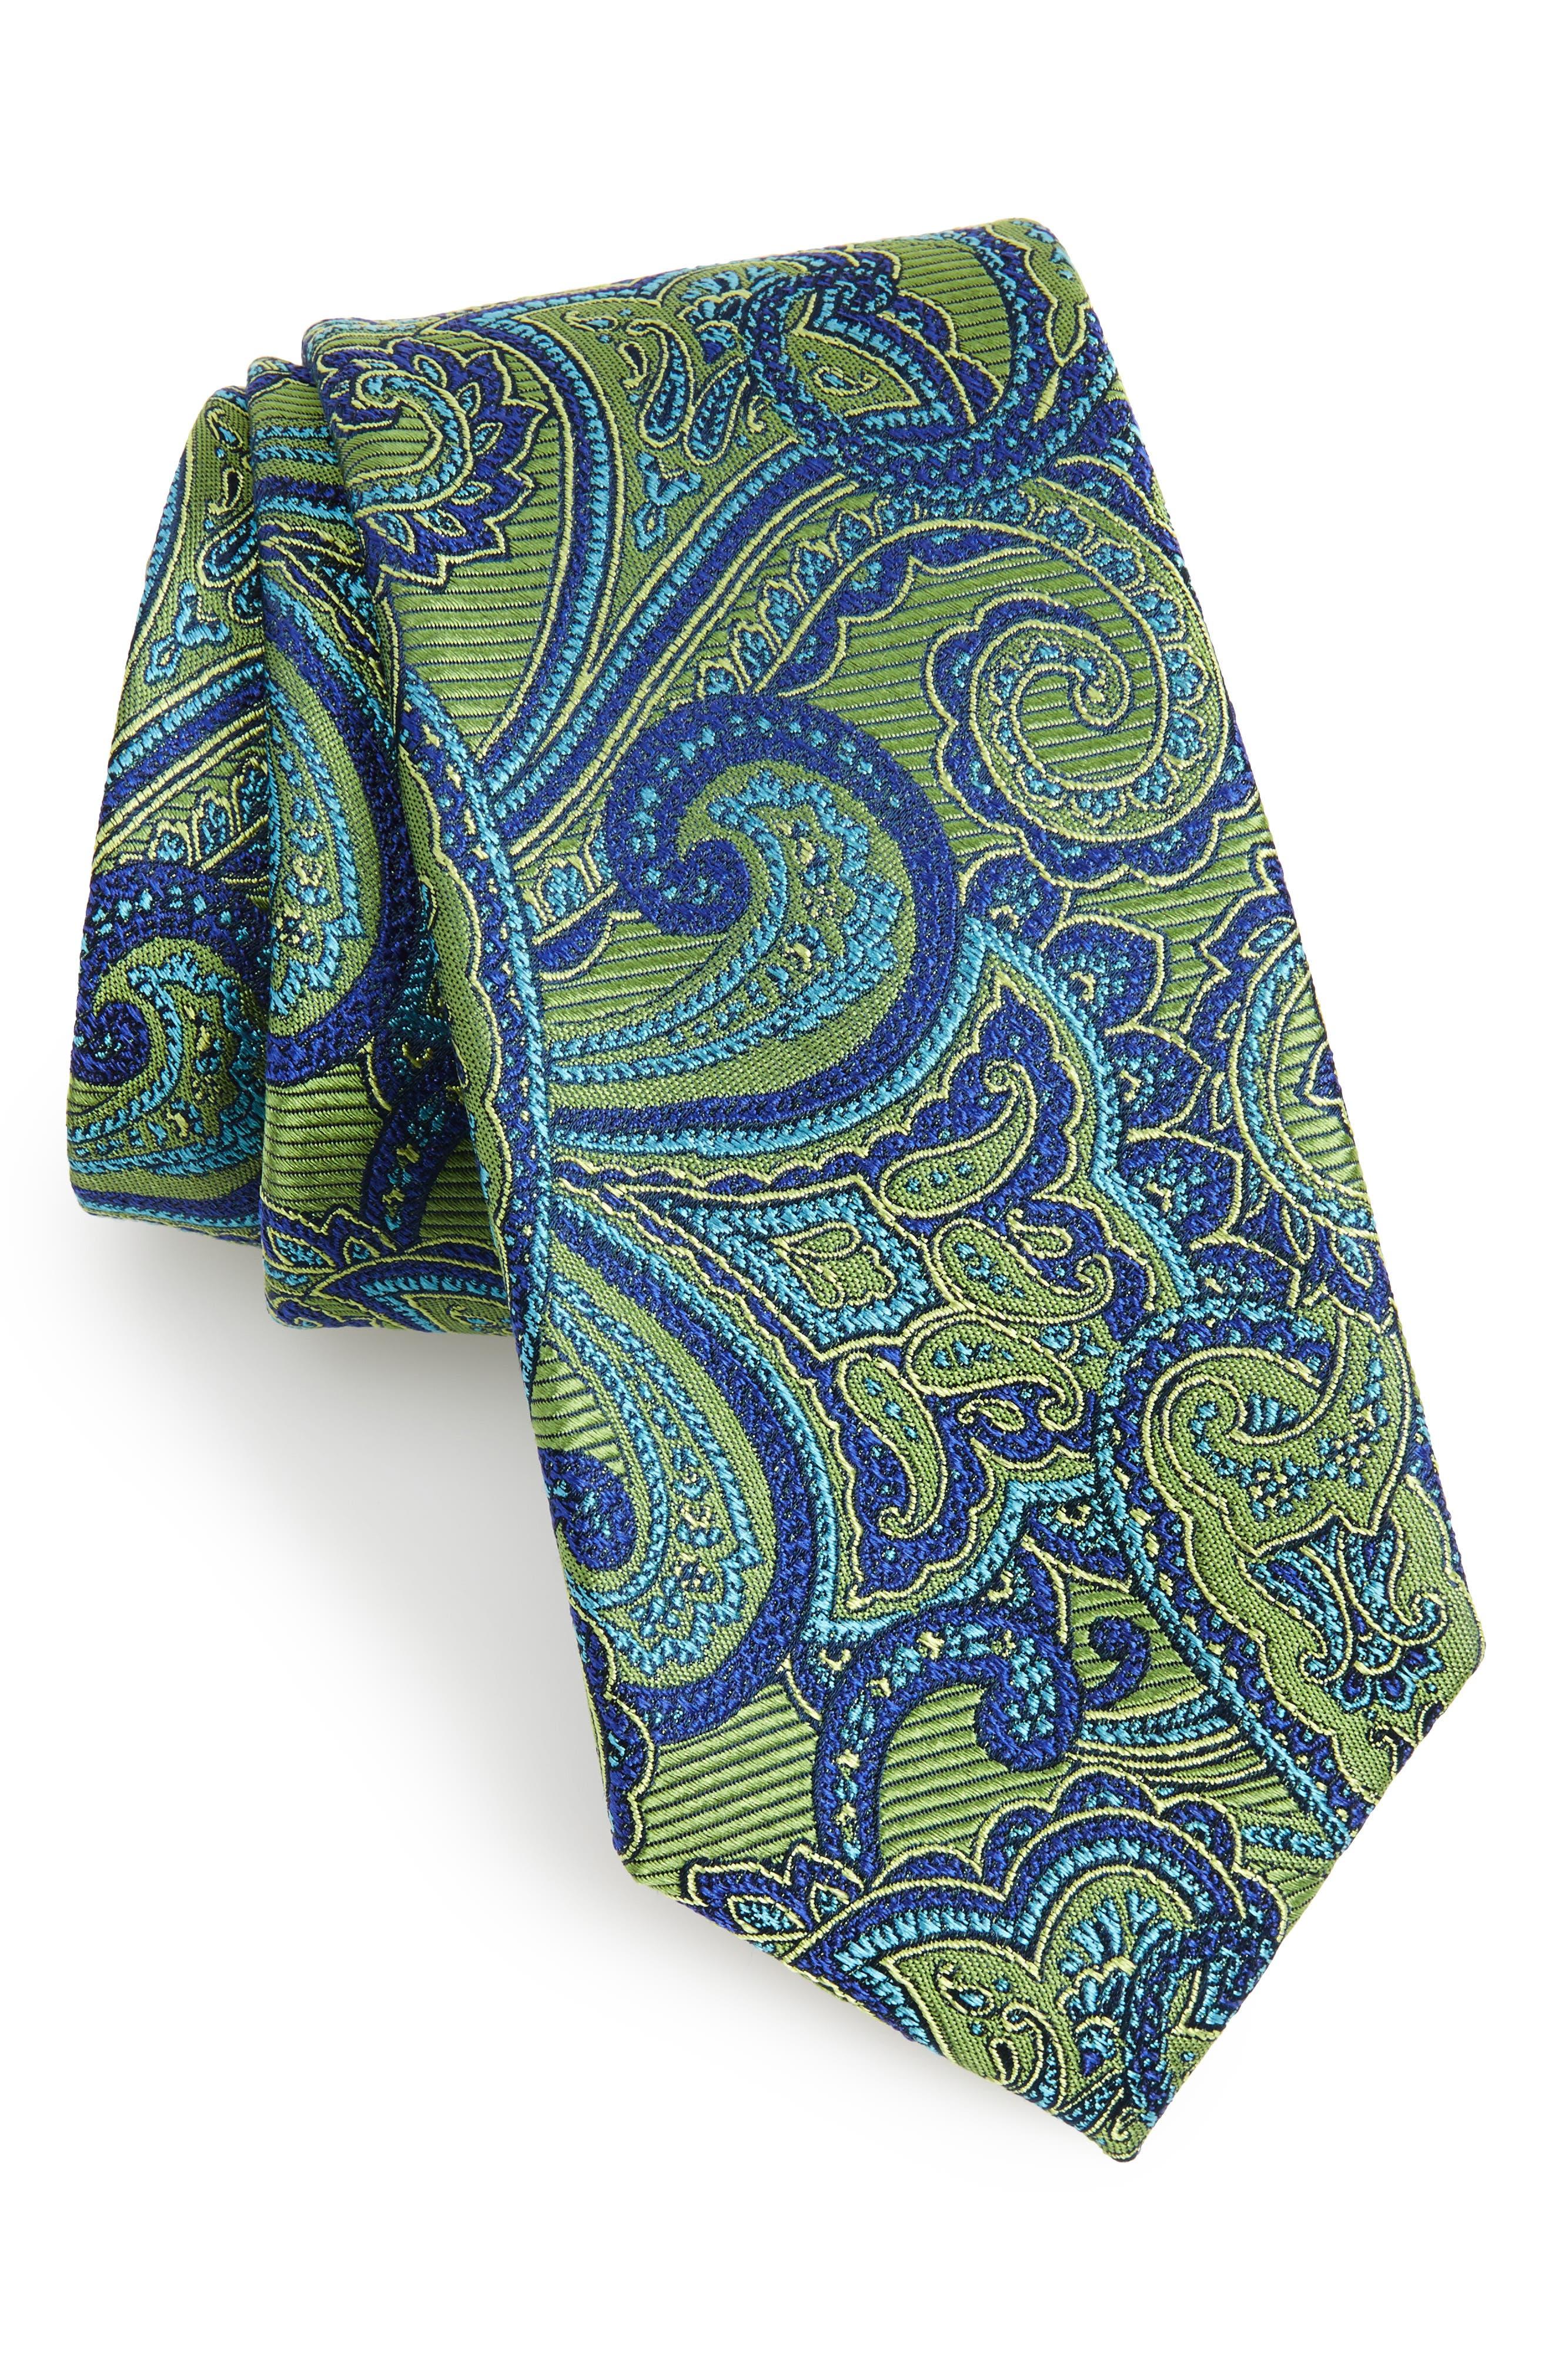 Main Image - Nordstrom Men's Shop Avalon Paisley Silk Tie